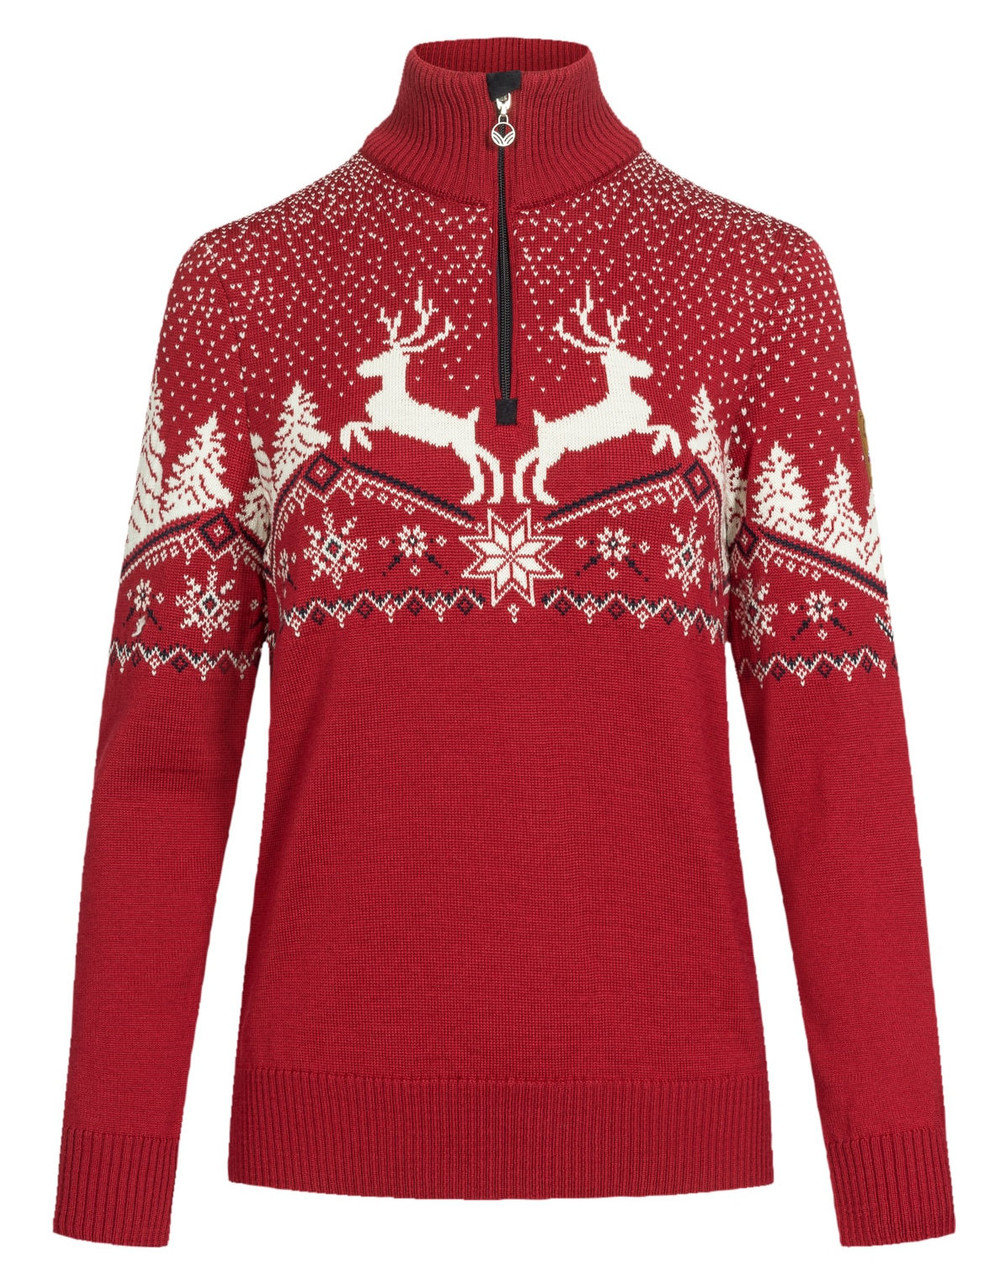 Dale Christmas Women's Sweater